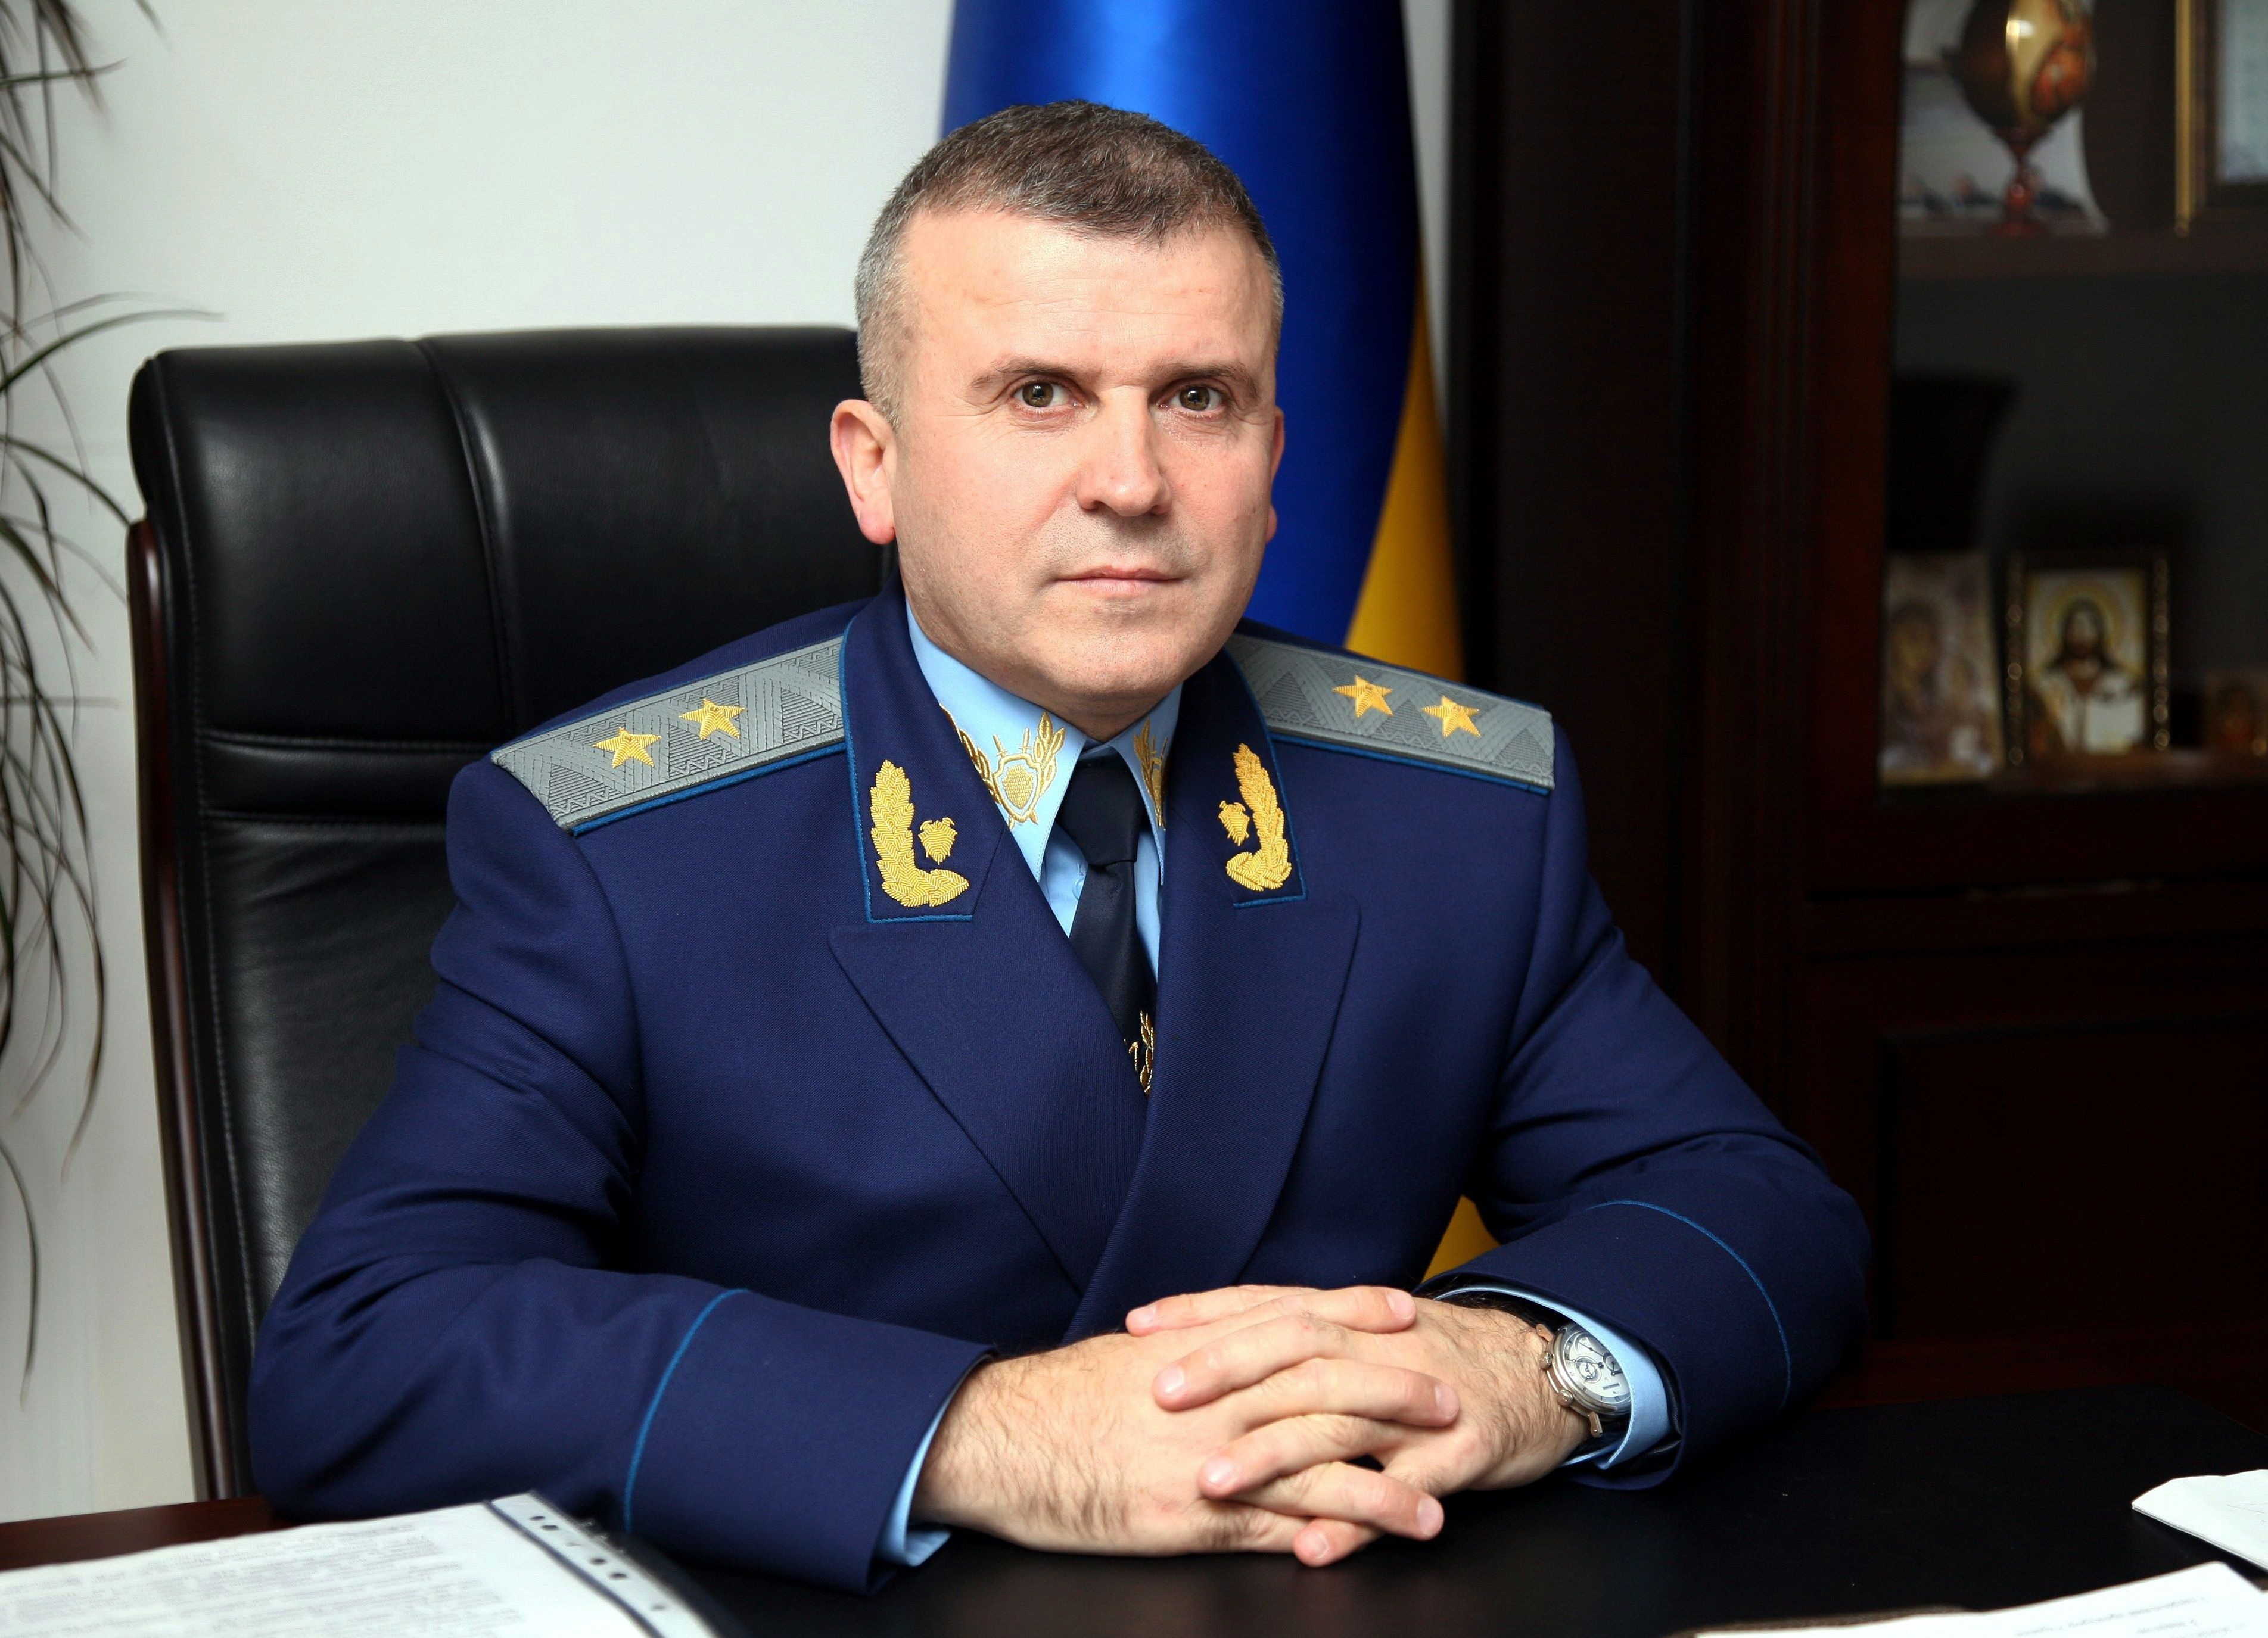 дайвингу для форма прокурора украины фото среди роз существуют